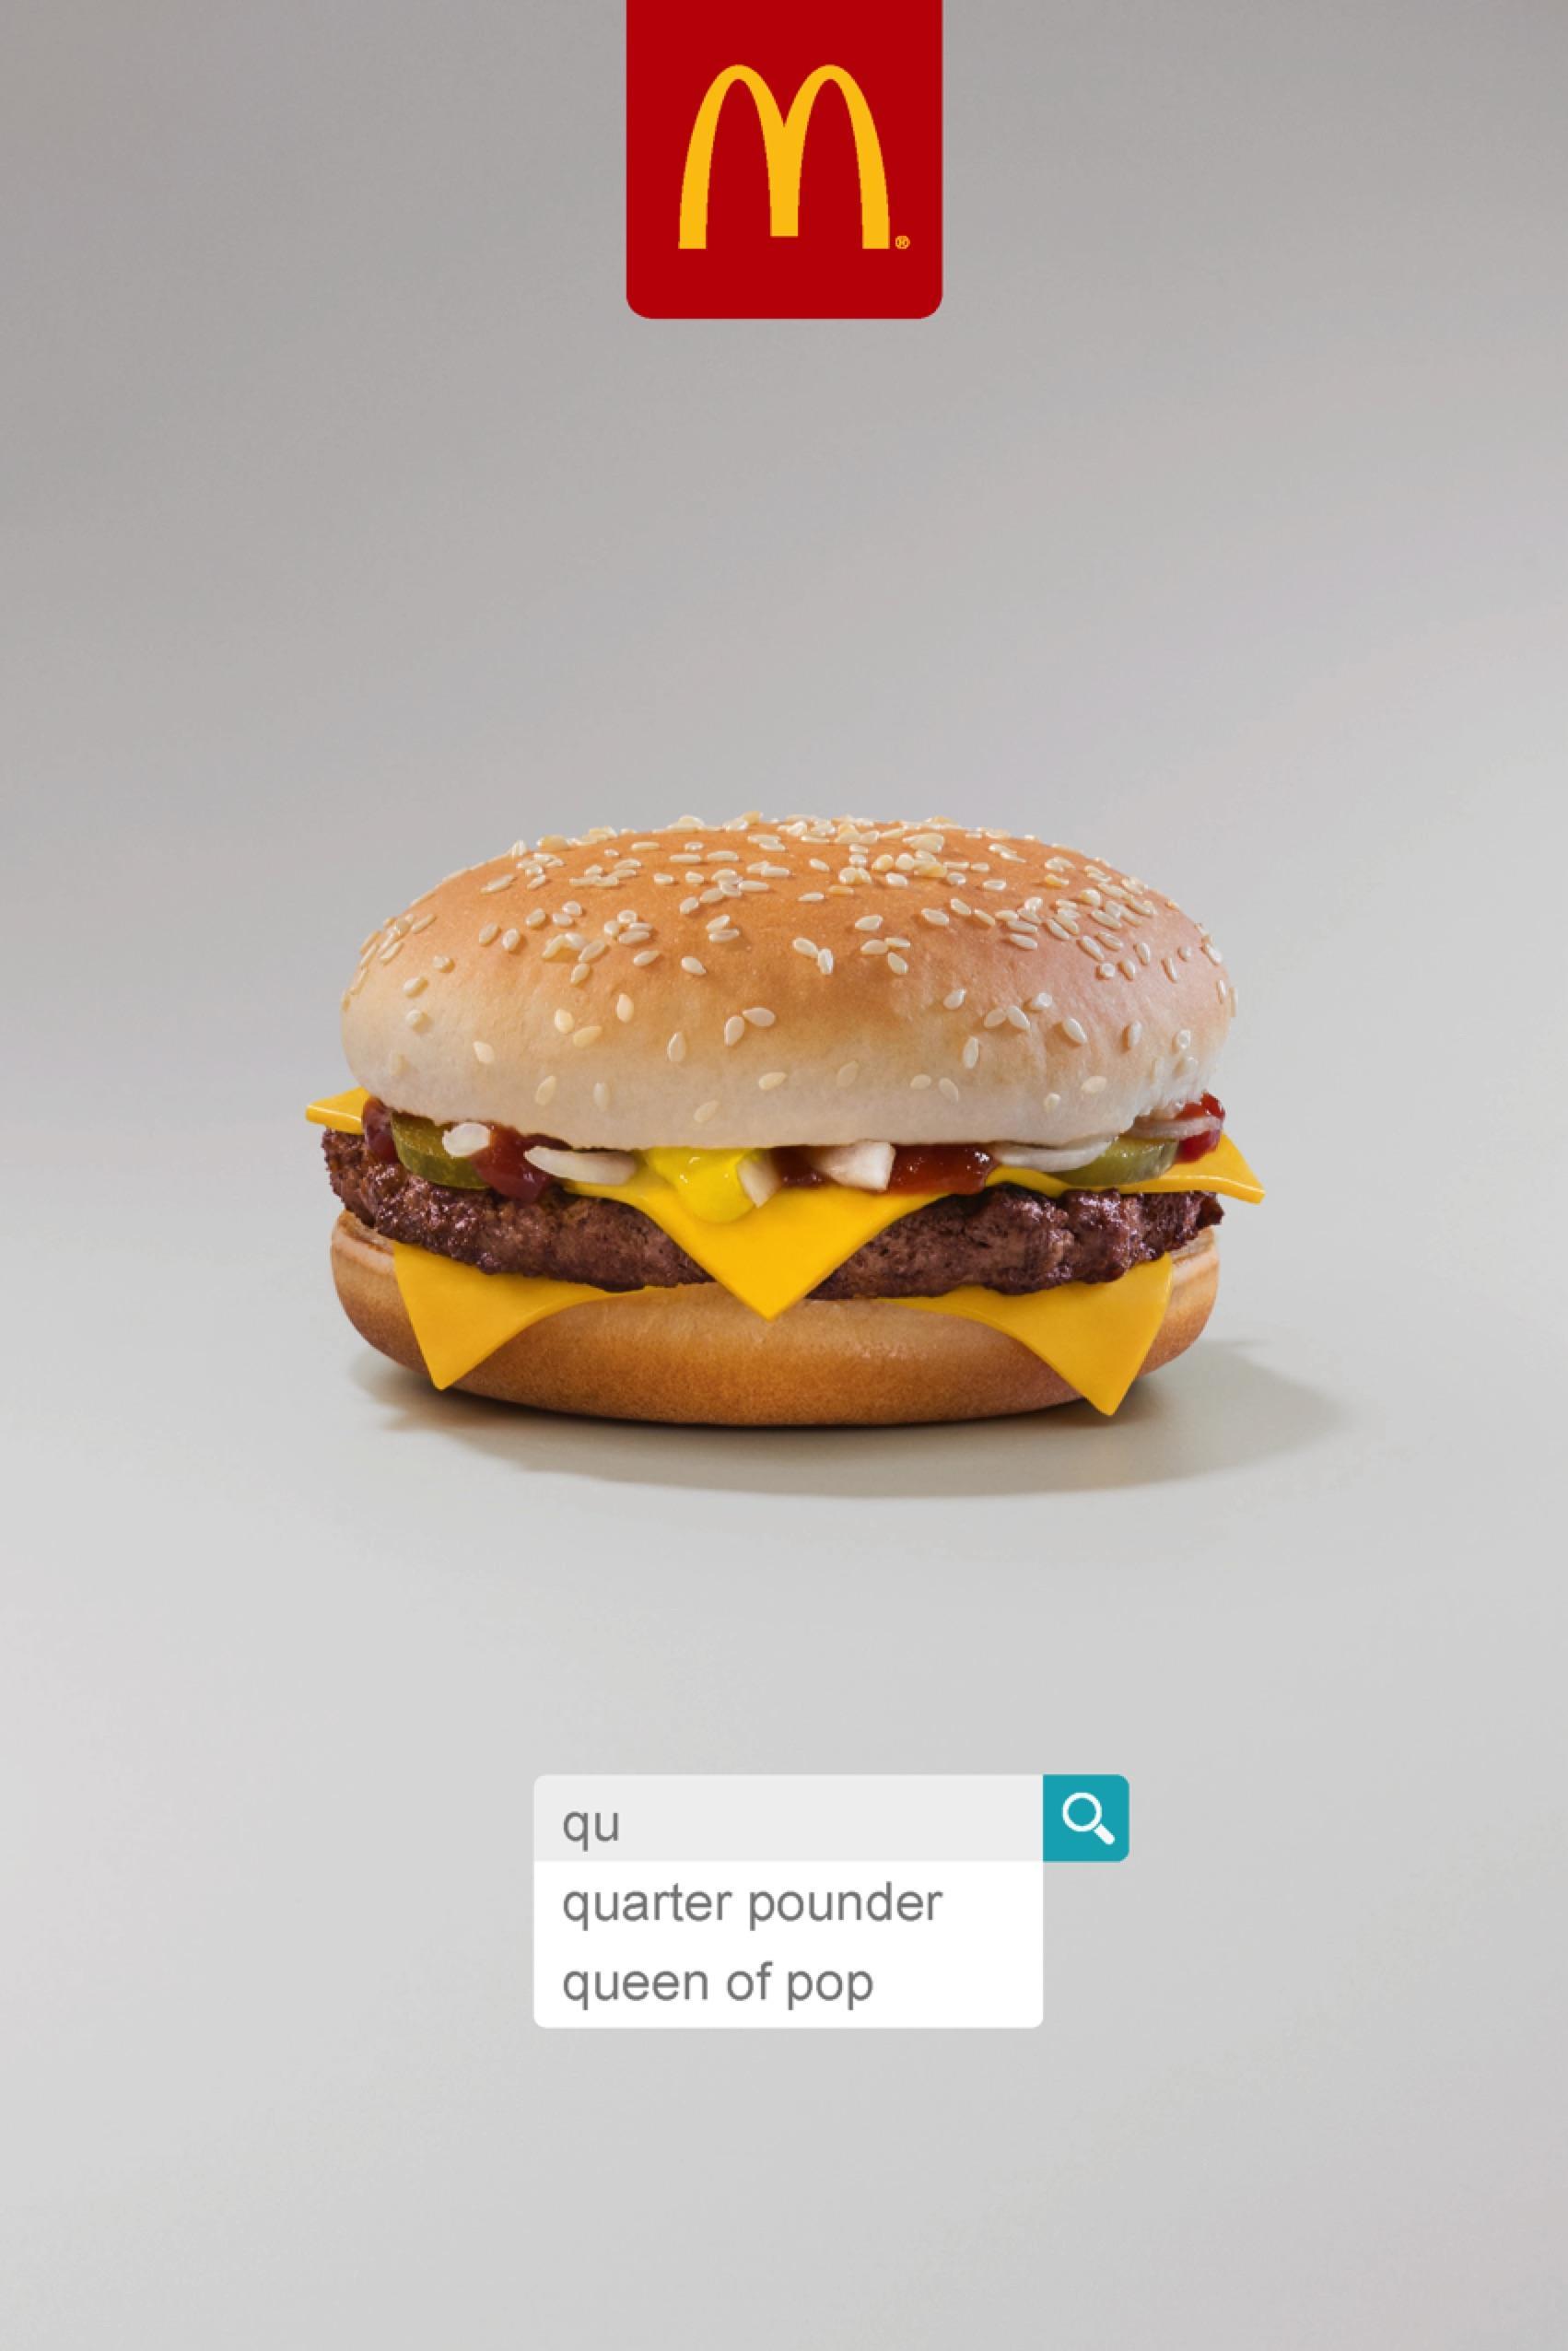 McDonald's Outdoor Ad - Quarter Pounder